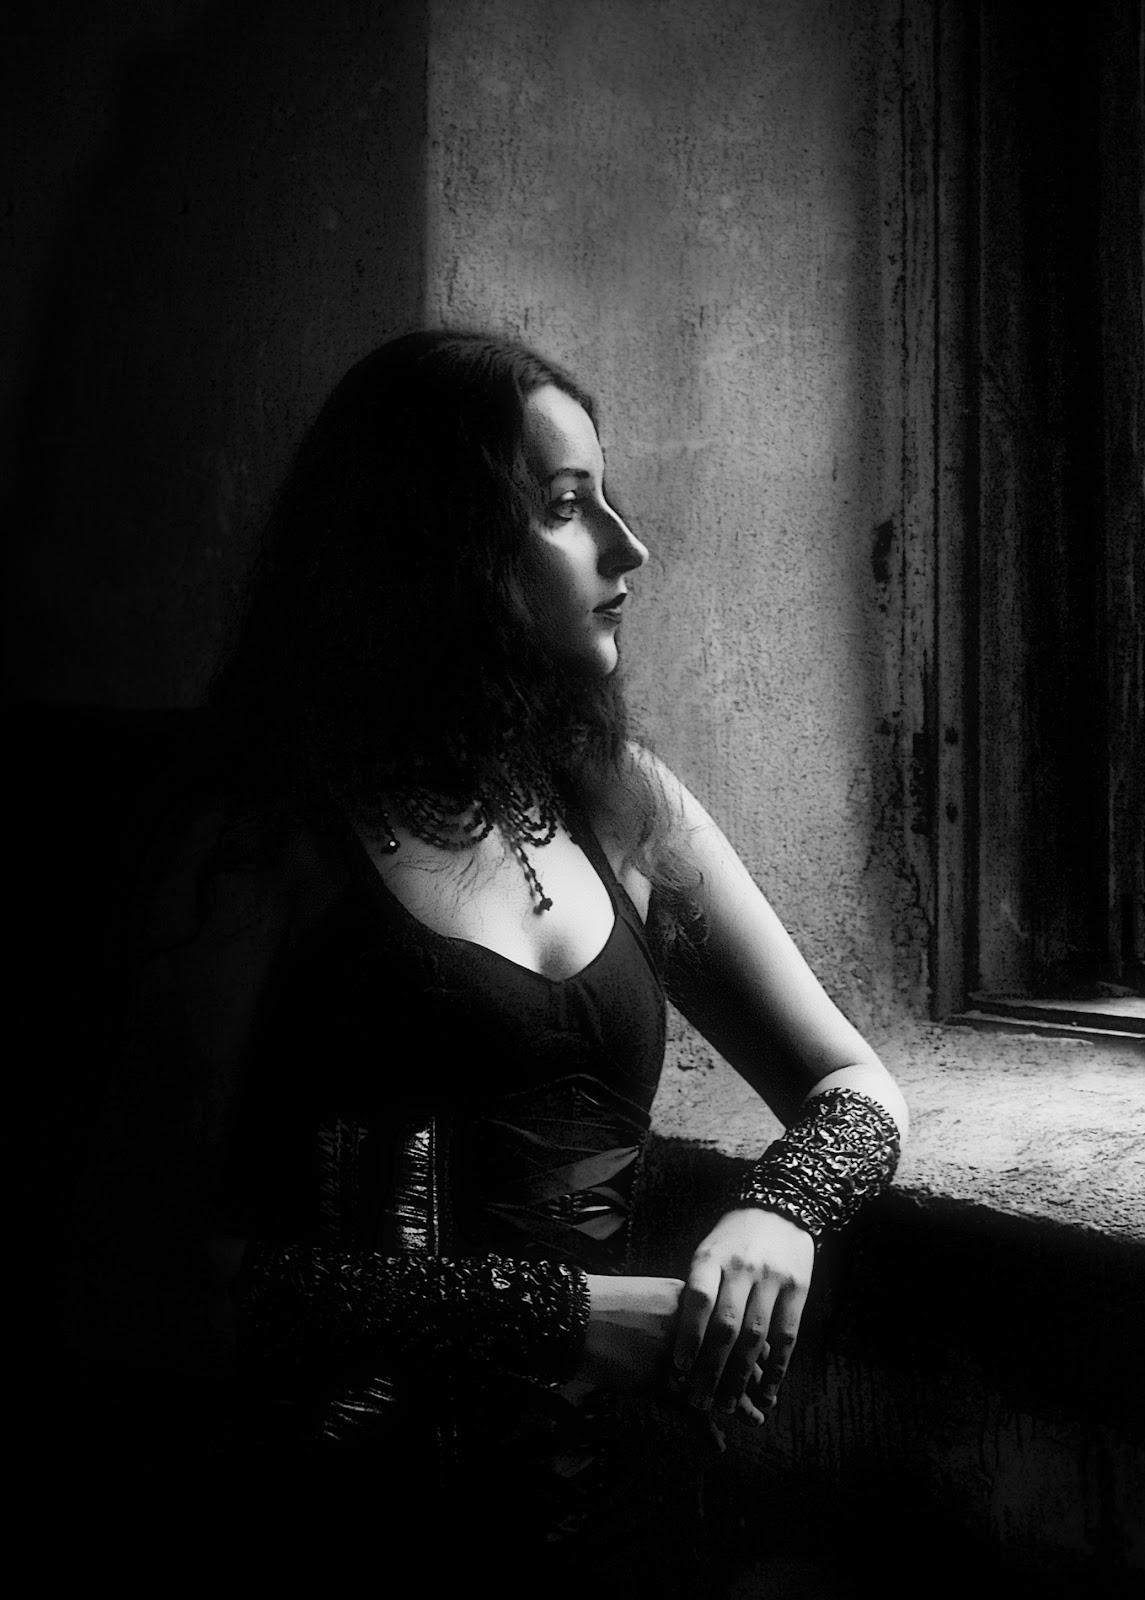 https://get.pxhere.com/photo/light-black-and-white-girl-white-photography-window-profile-portrait-model-sitting-darkness-black-monochrome-lady-gothic-photograph-beauty-costume-emotion-photo-shoot-portrait-of-a-girl-riddle-monochrome-photography-portrait-photography-film-noir-human-positions-833054.jpg